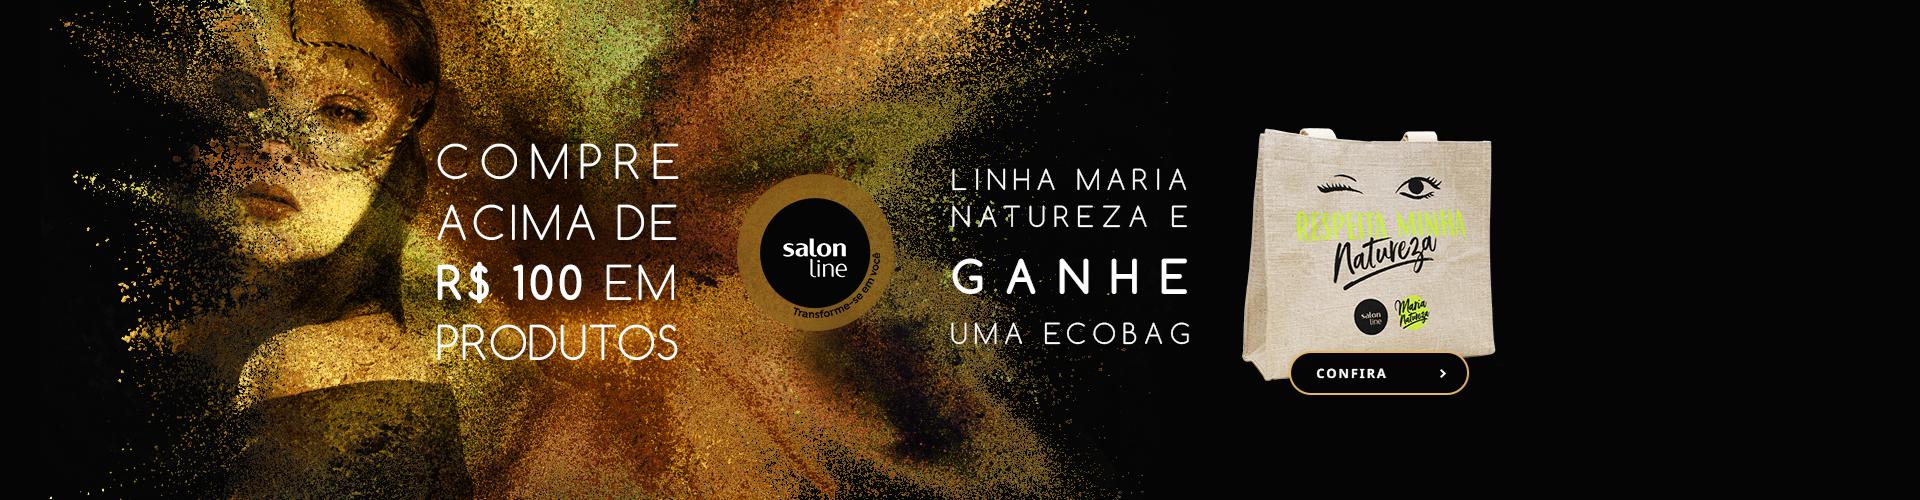 Salon Line  - Maria Natureza